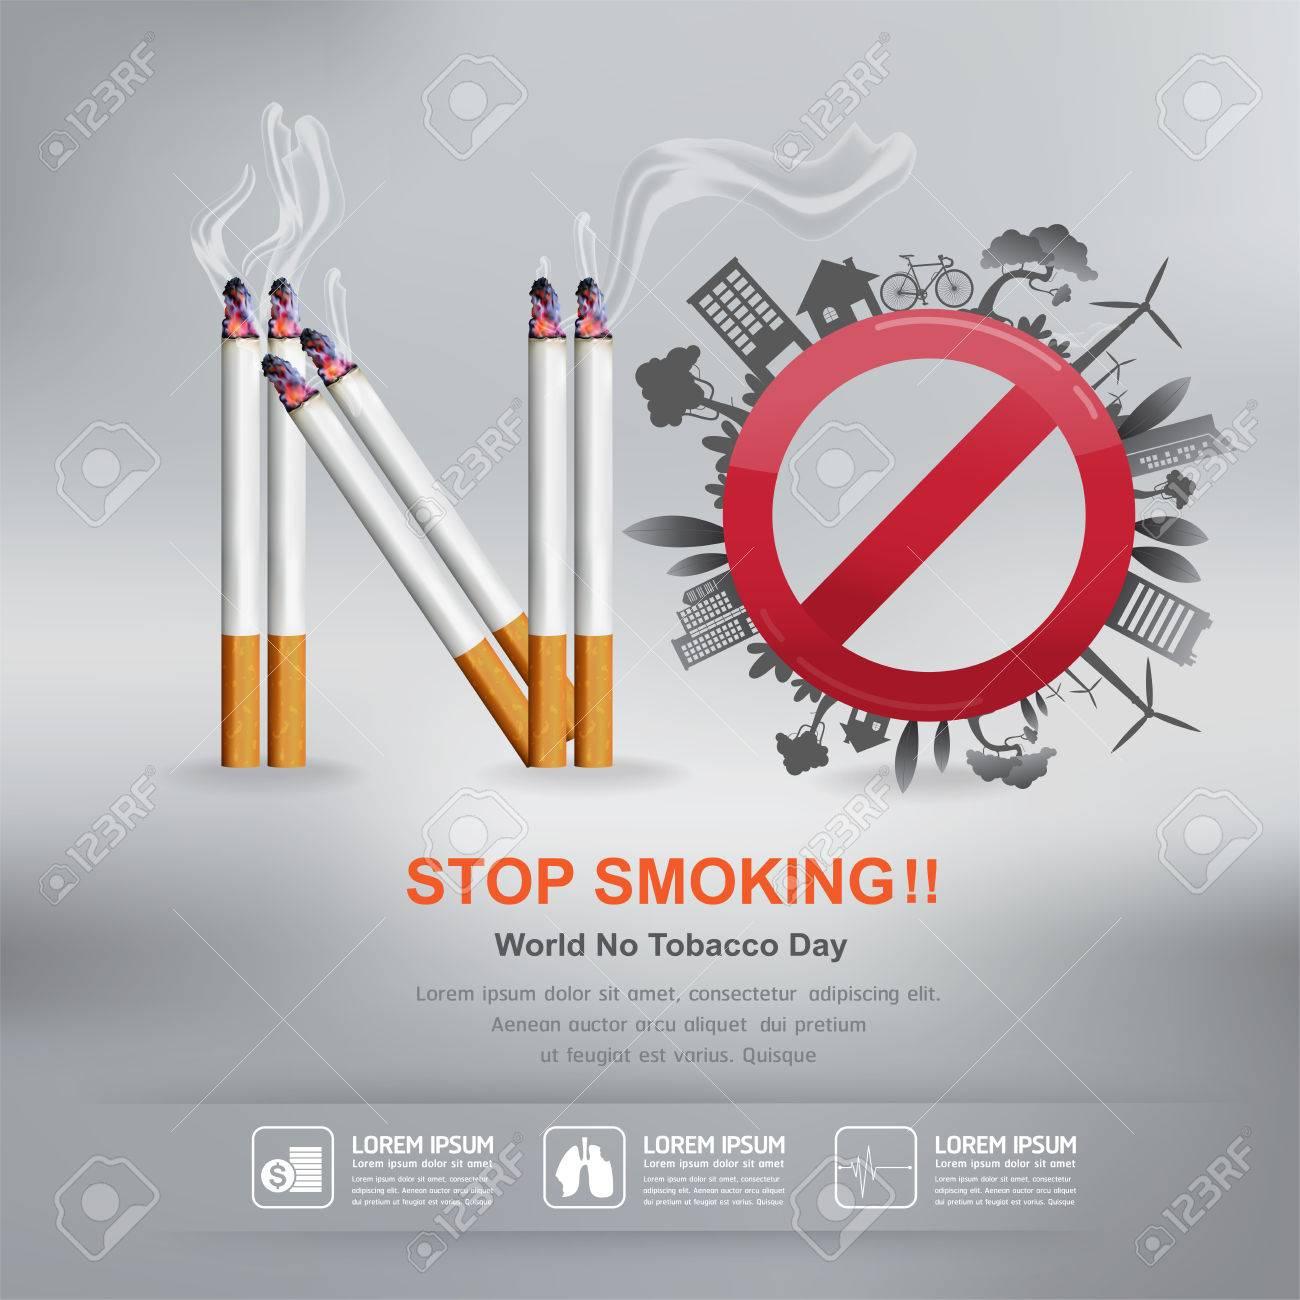 World No Tobacco Day Vector Concept Stop Smoking - 50203806